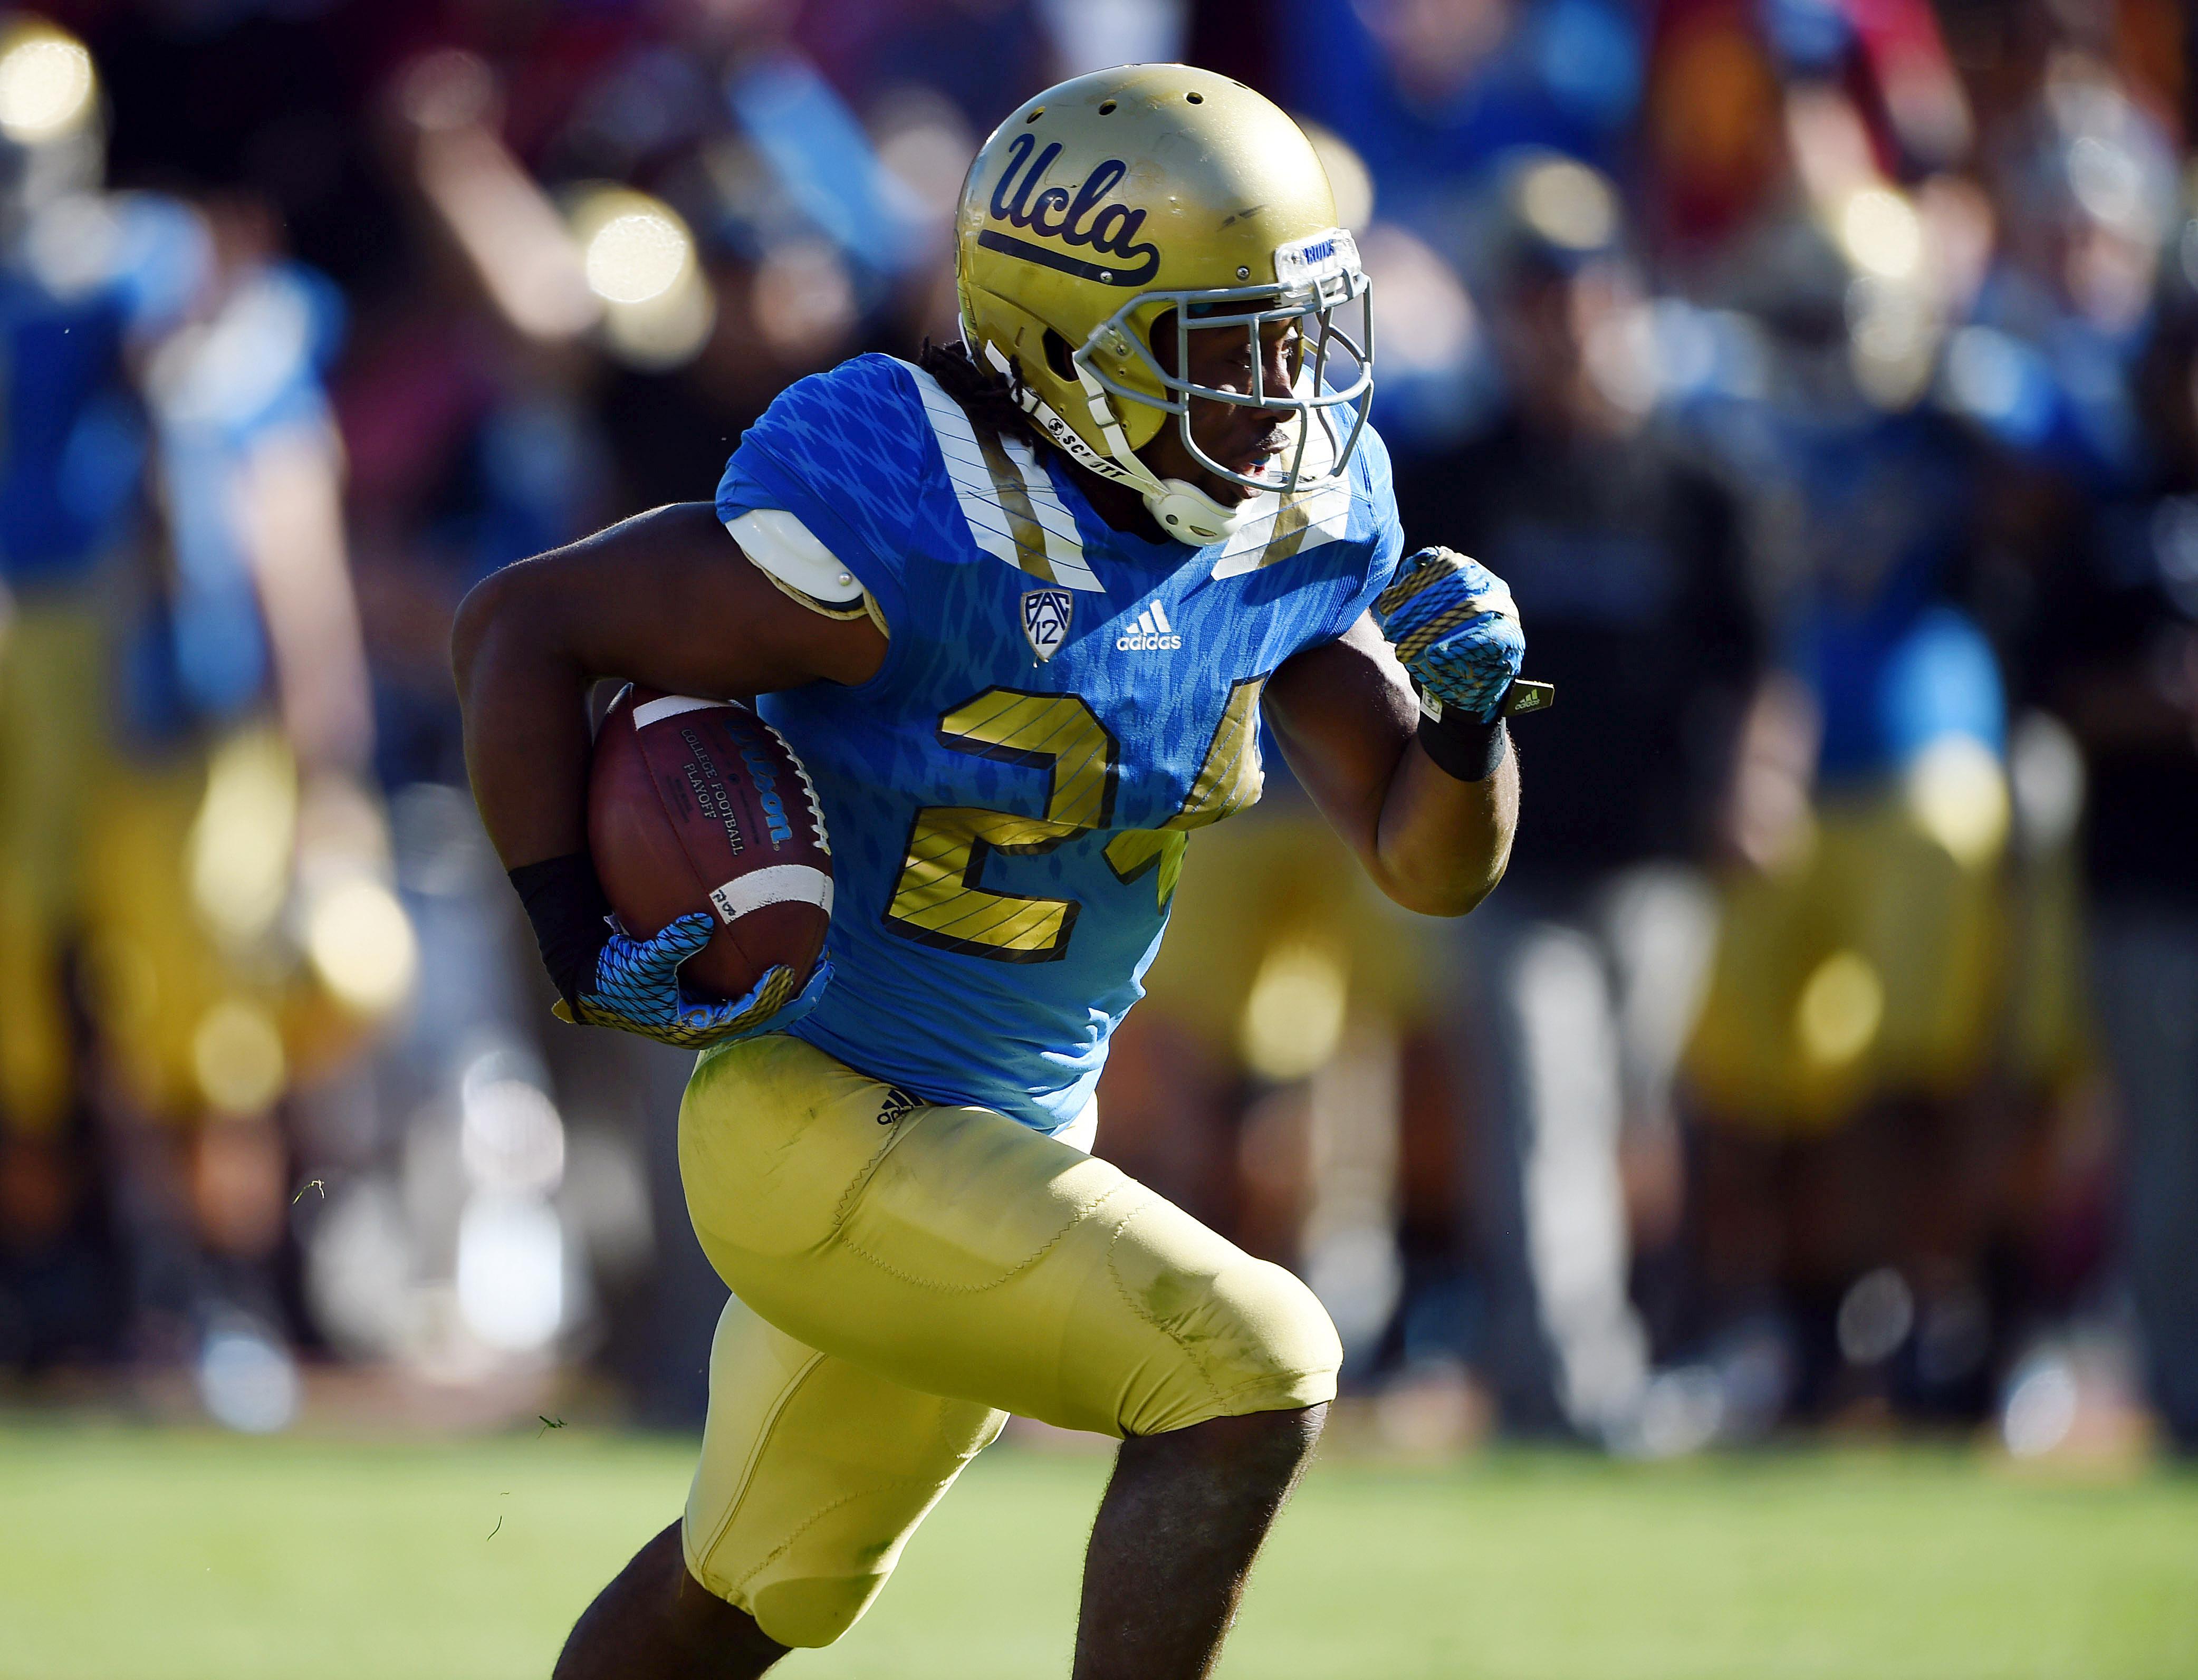 UCLA running back, Paul Perkins